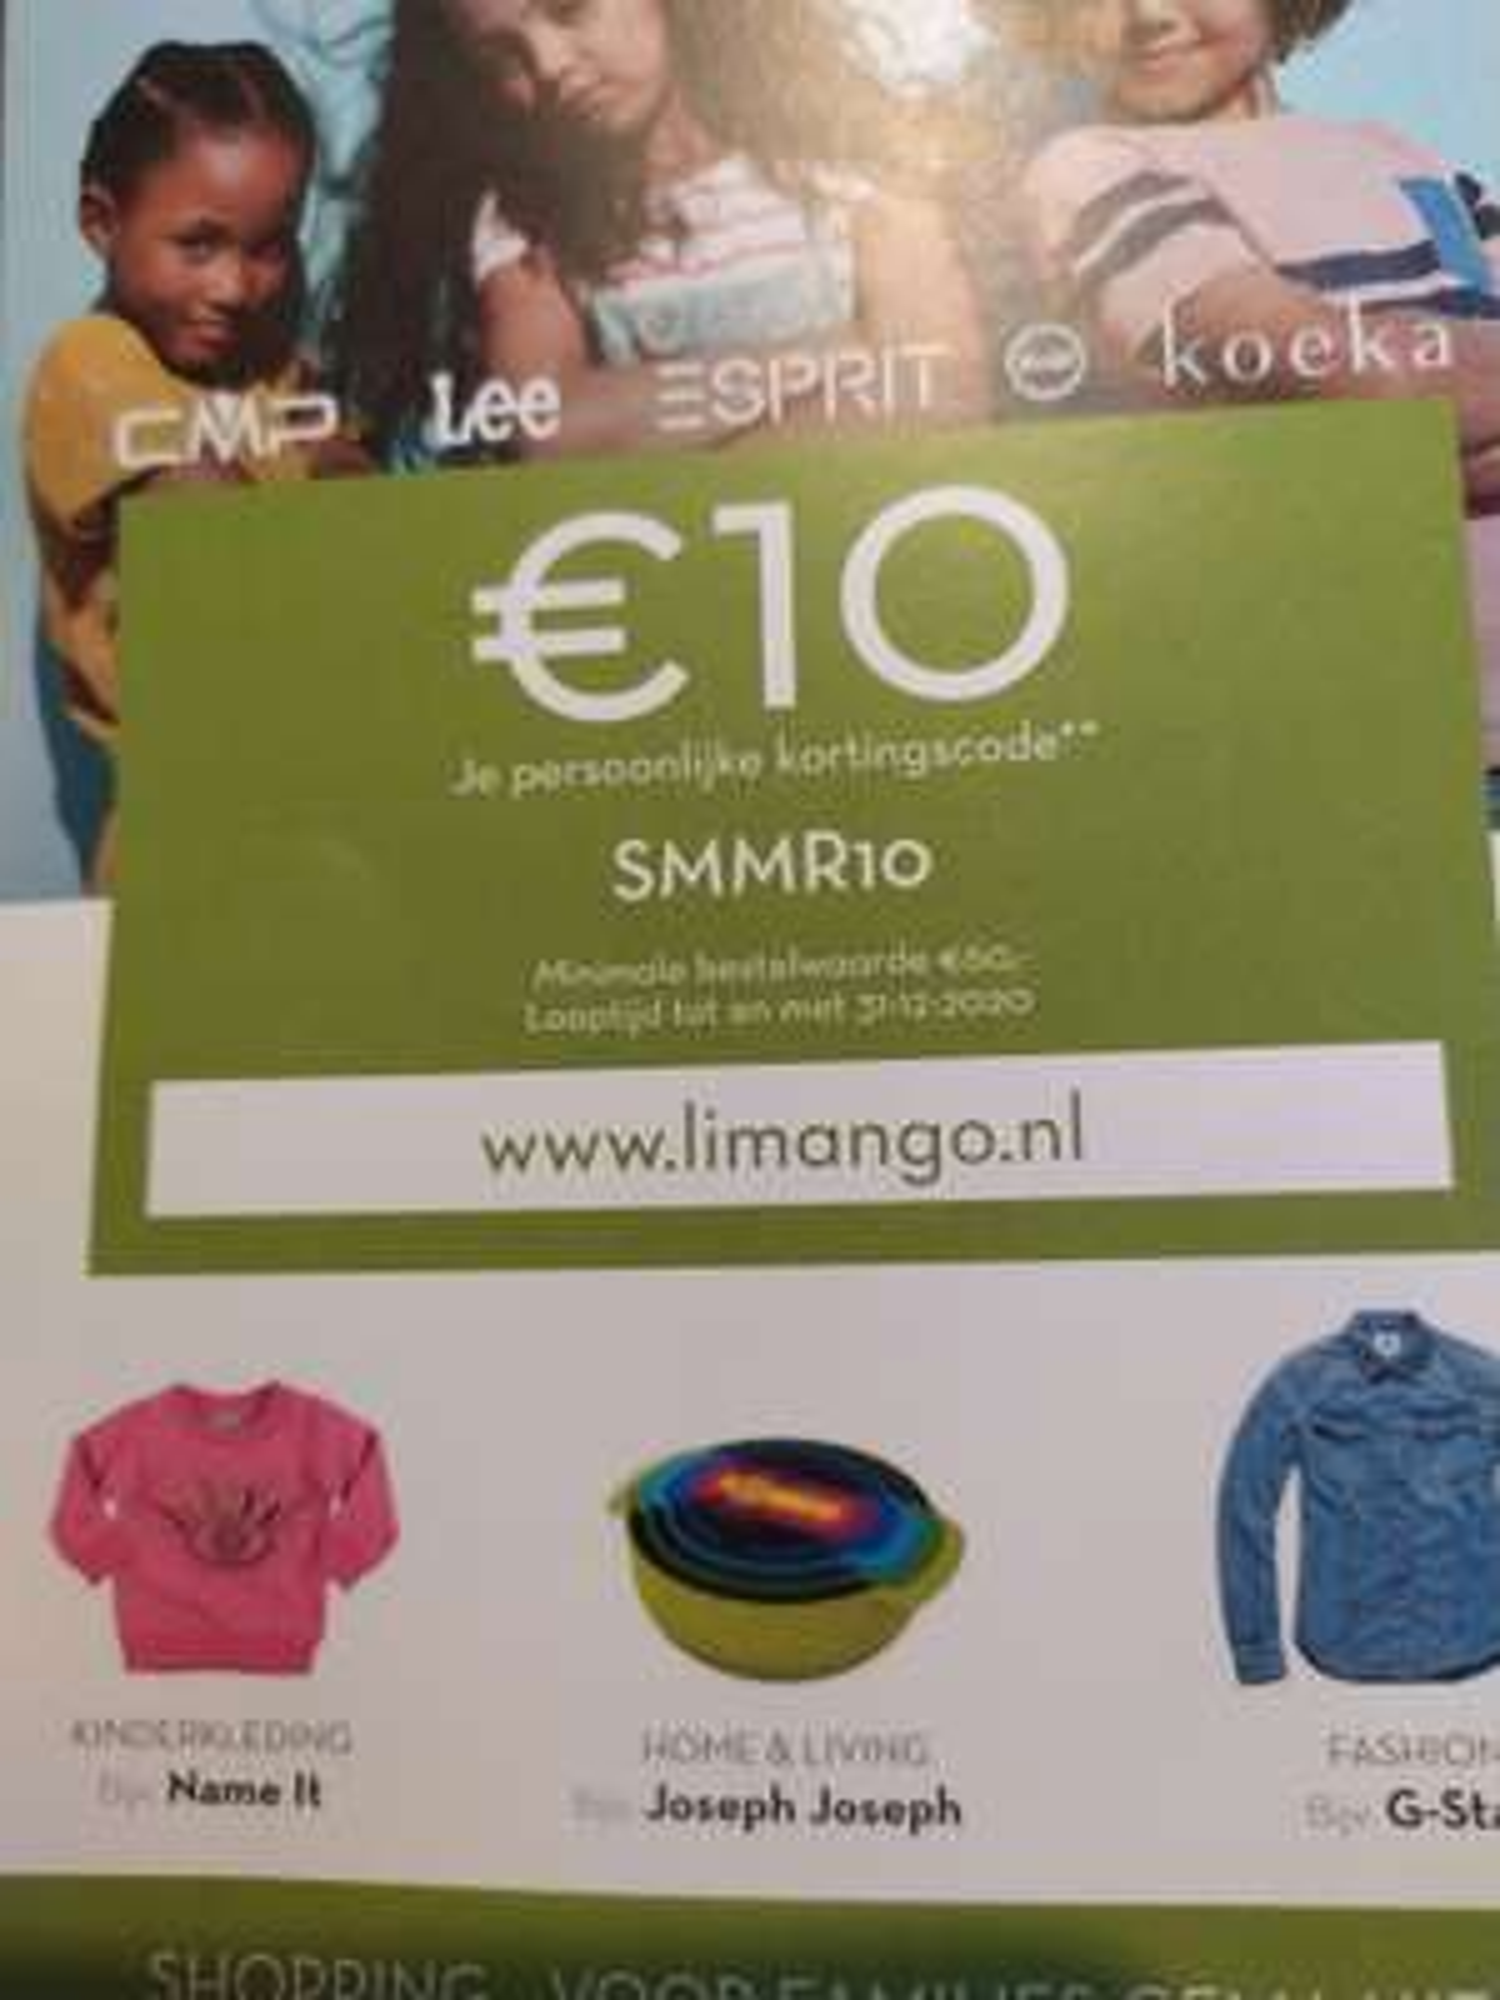 Limango.nl €10 korting bij minimale besteding van €60